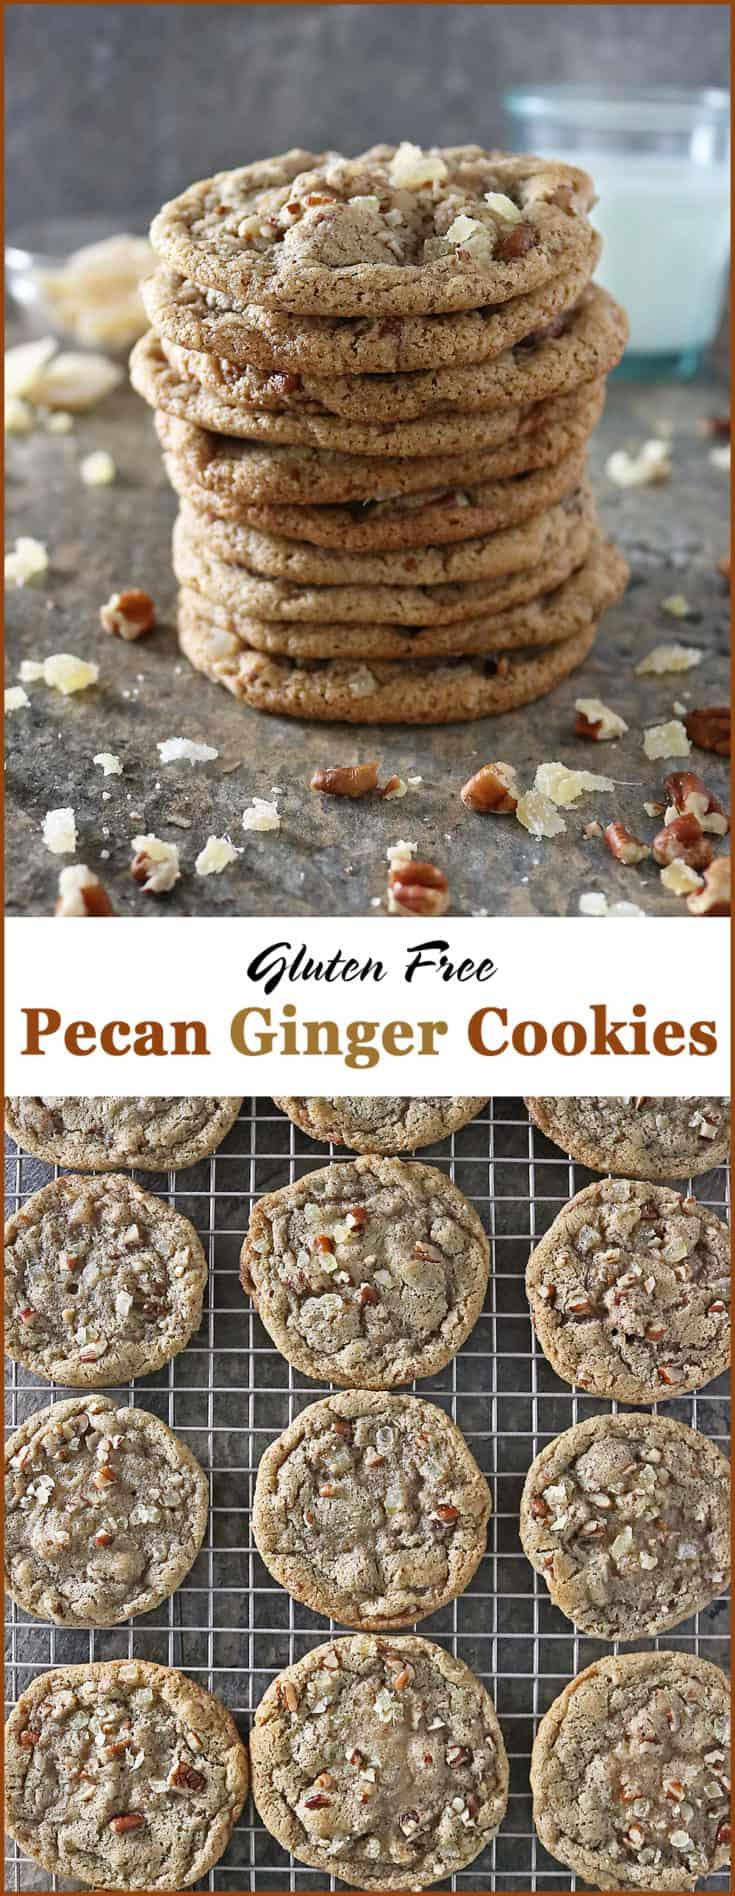 #ad Gluten Free Pecan Ginger Cookies Prepped with FoodSaver® FM5330 Vacuum Sealing System And FoodSaver® 6 pk Heat Seal Rolls #PrepNowSavorLater #StockPrepWin